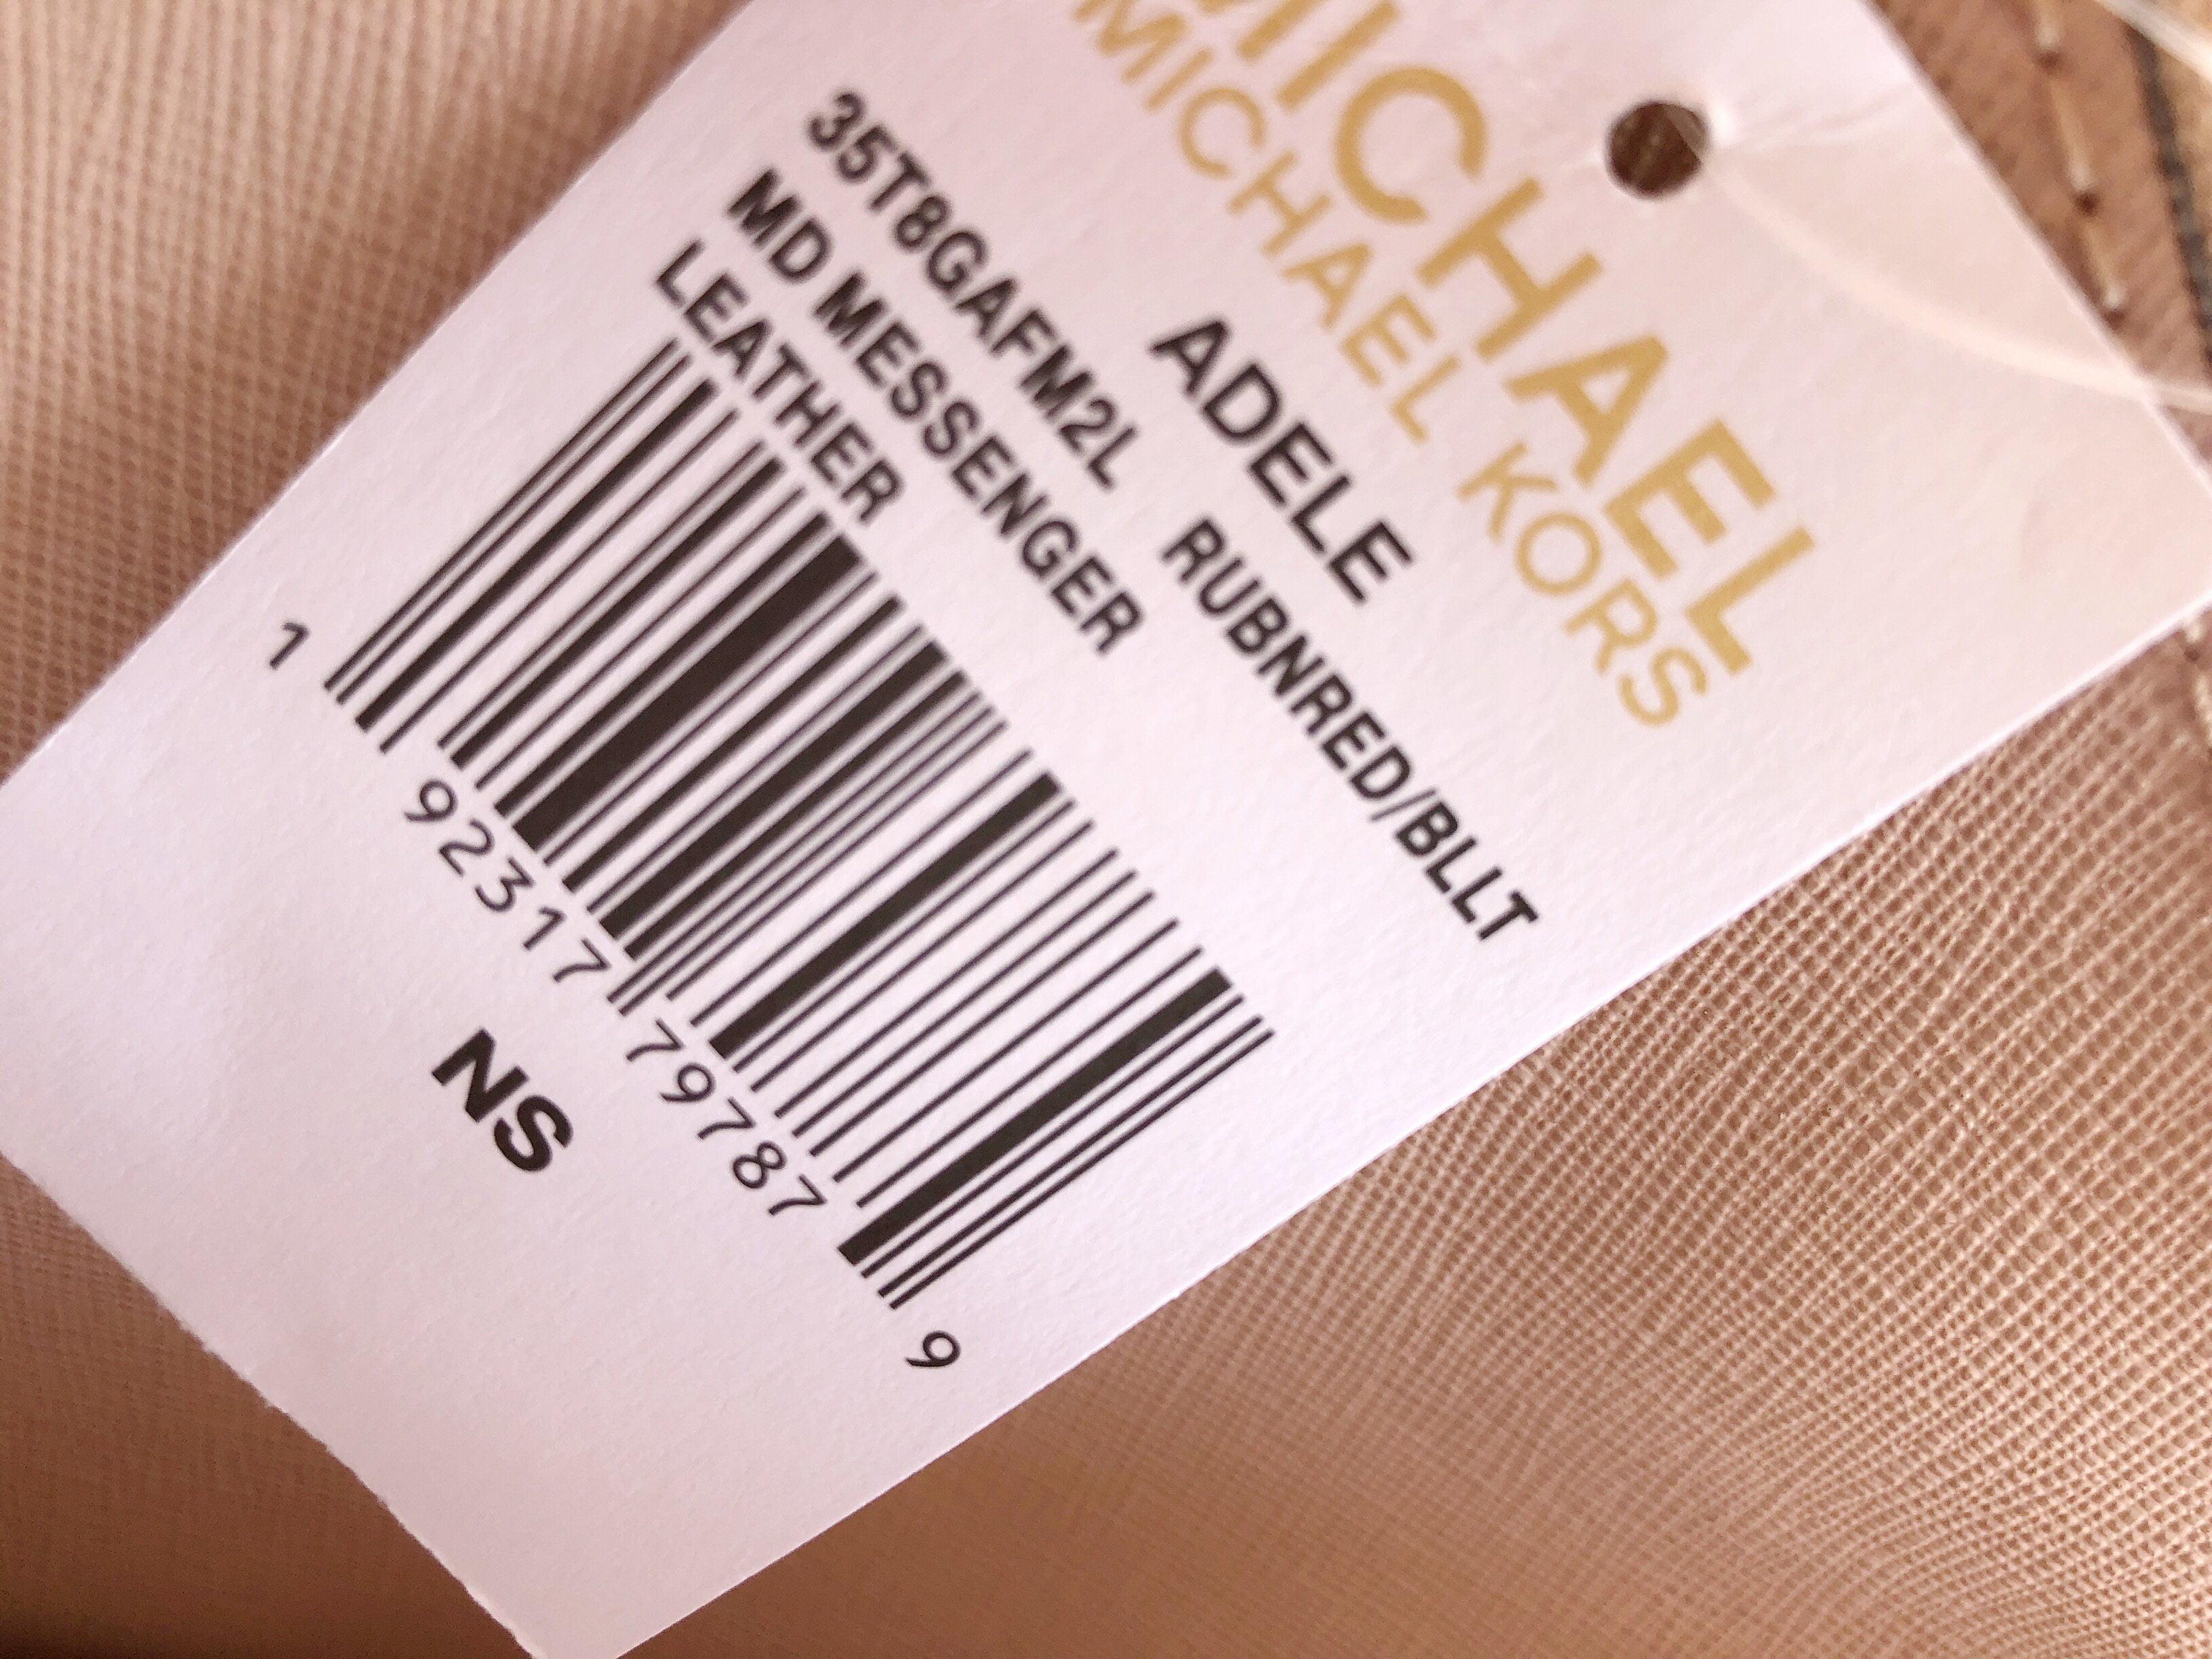 e12da6e2668a Michael Kors Adele Mercer Medium Messenger Bag Ruben Red Hot Pink -  Walmart.com